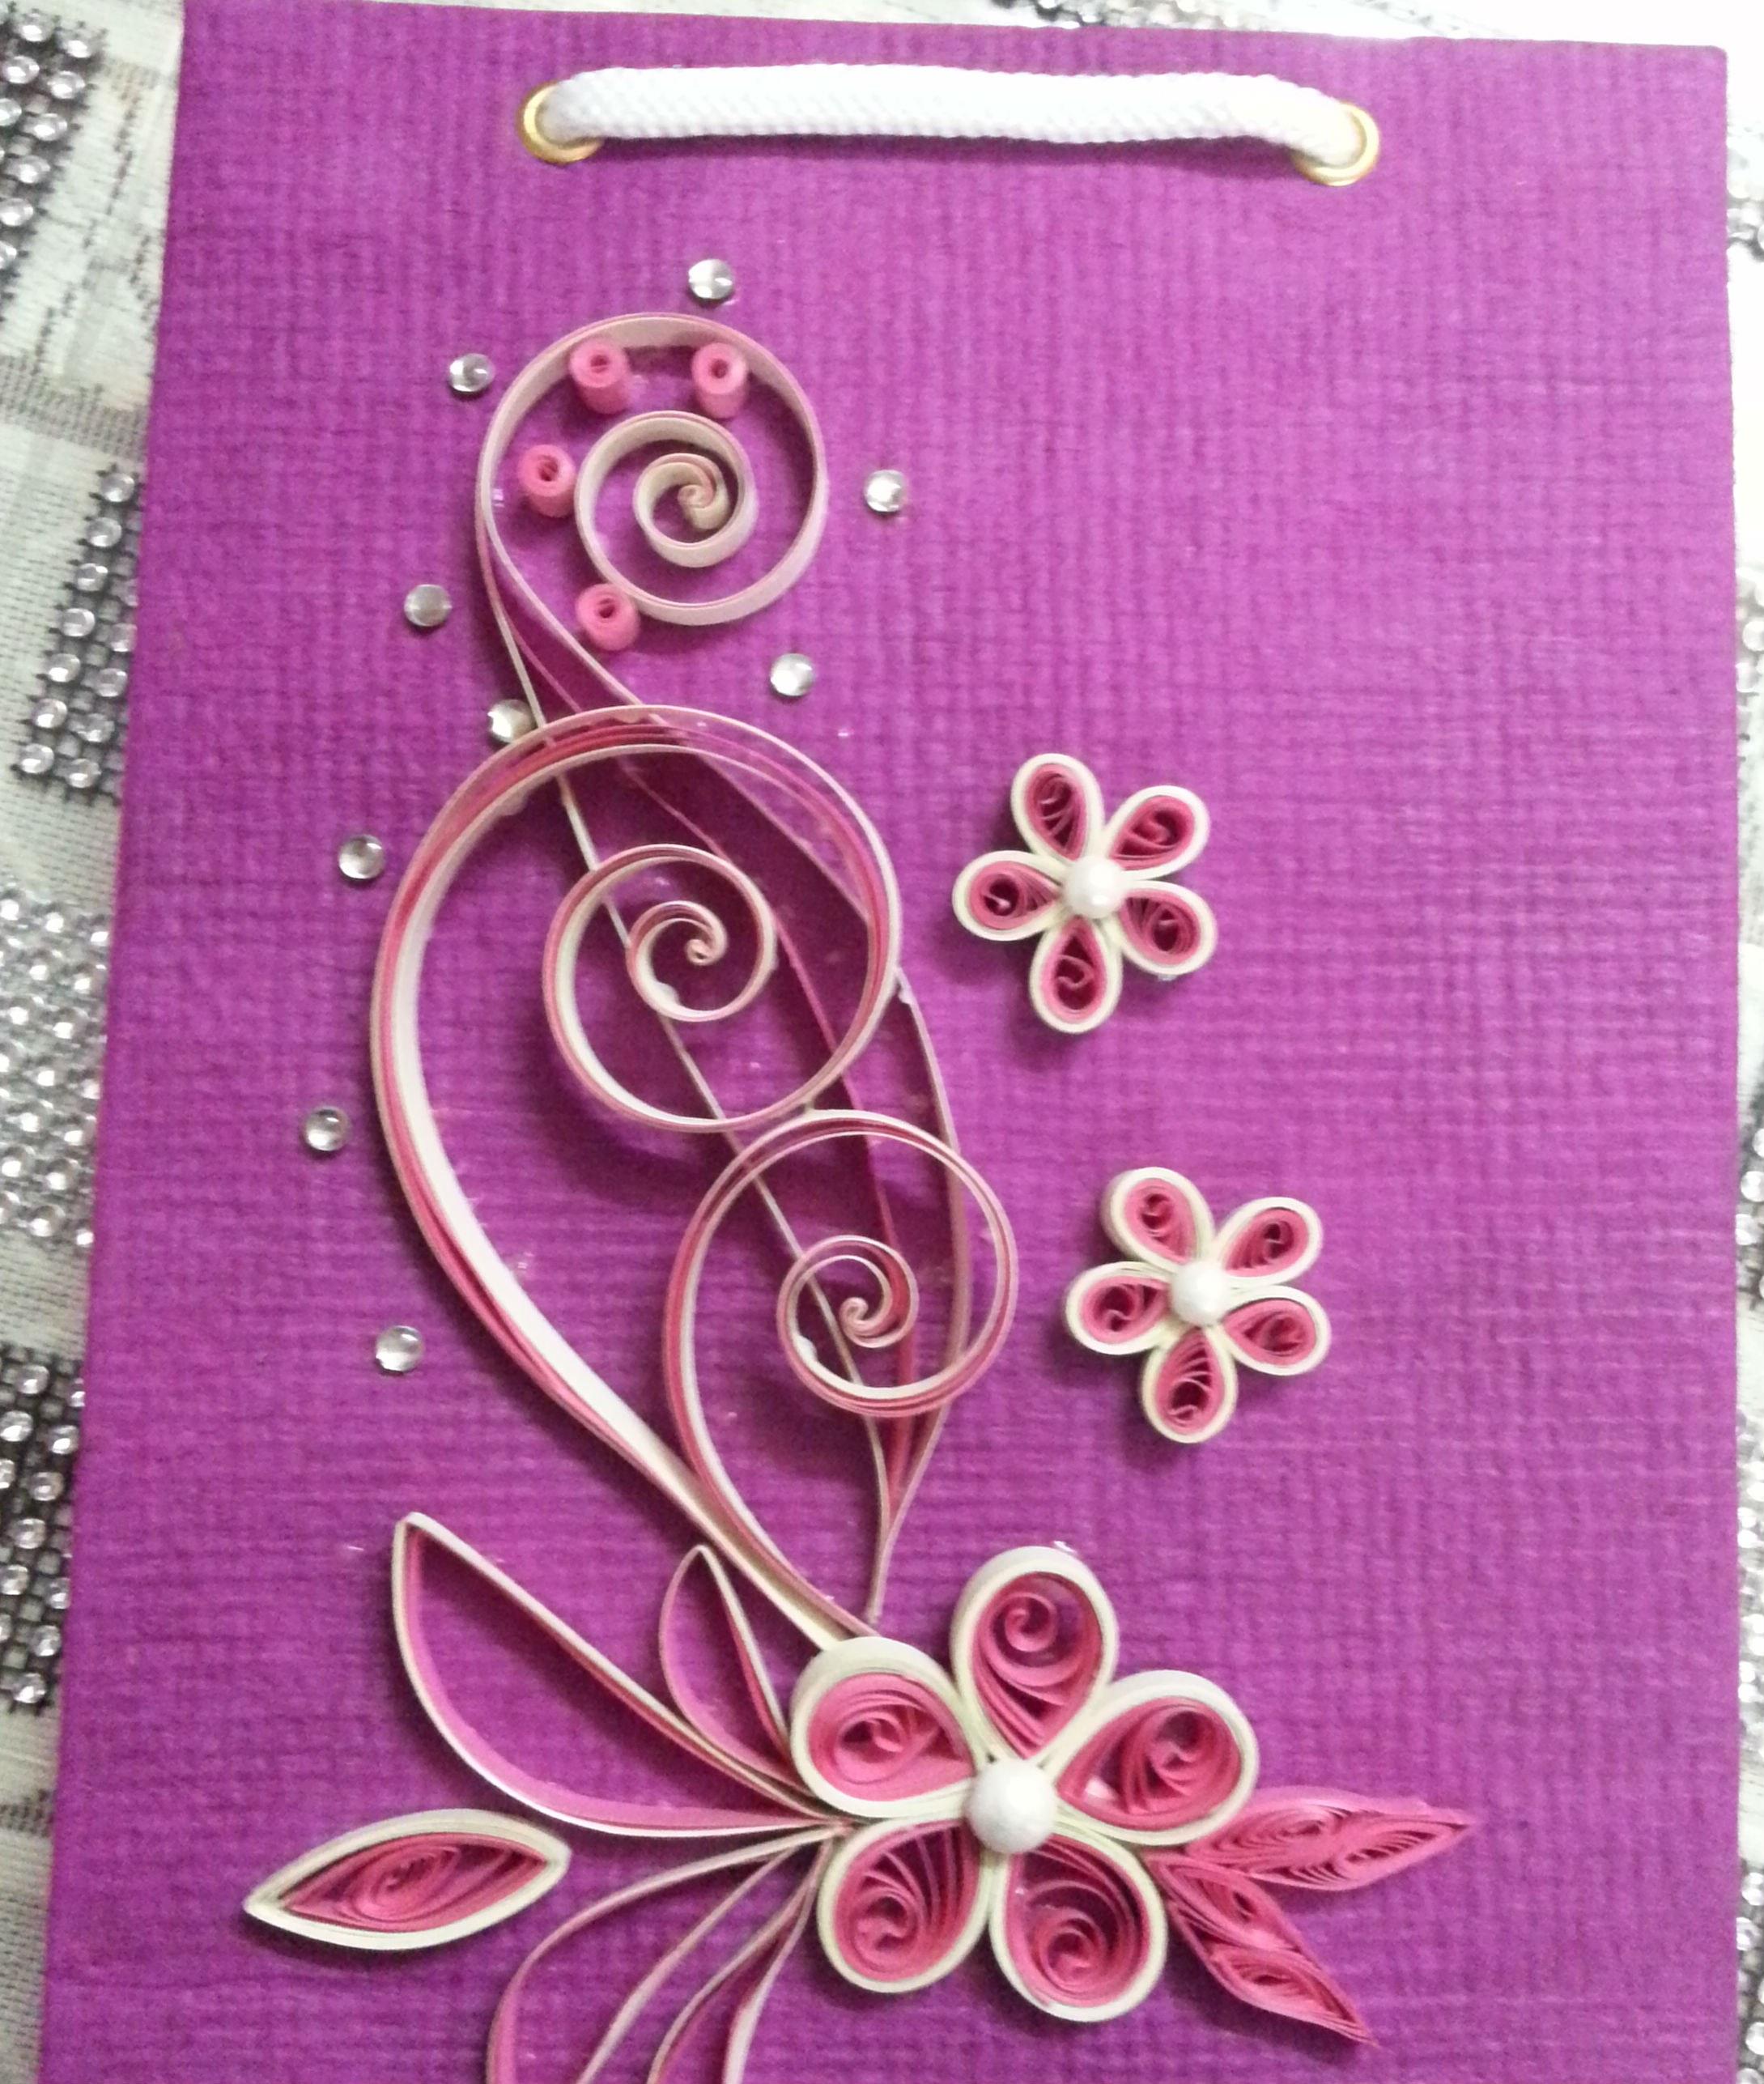 Buy custom paper shapes